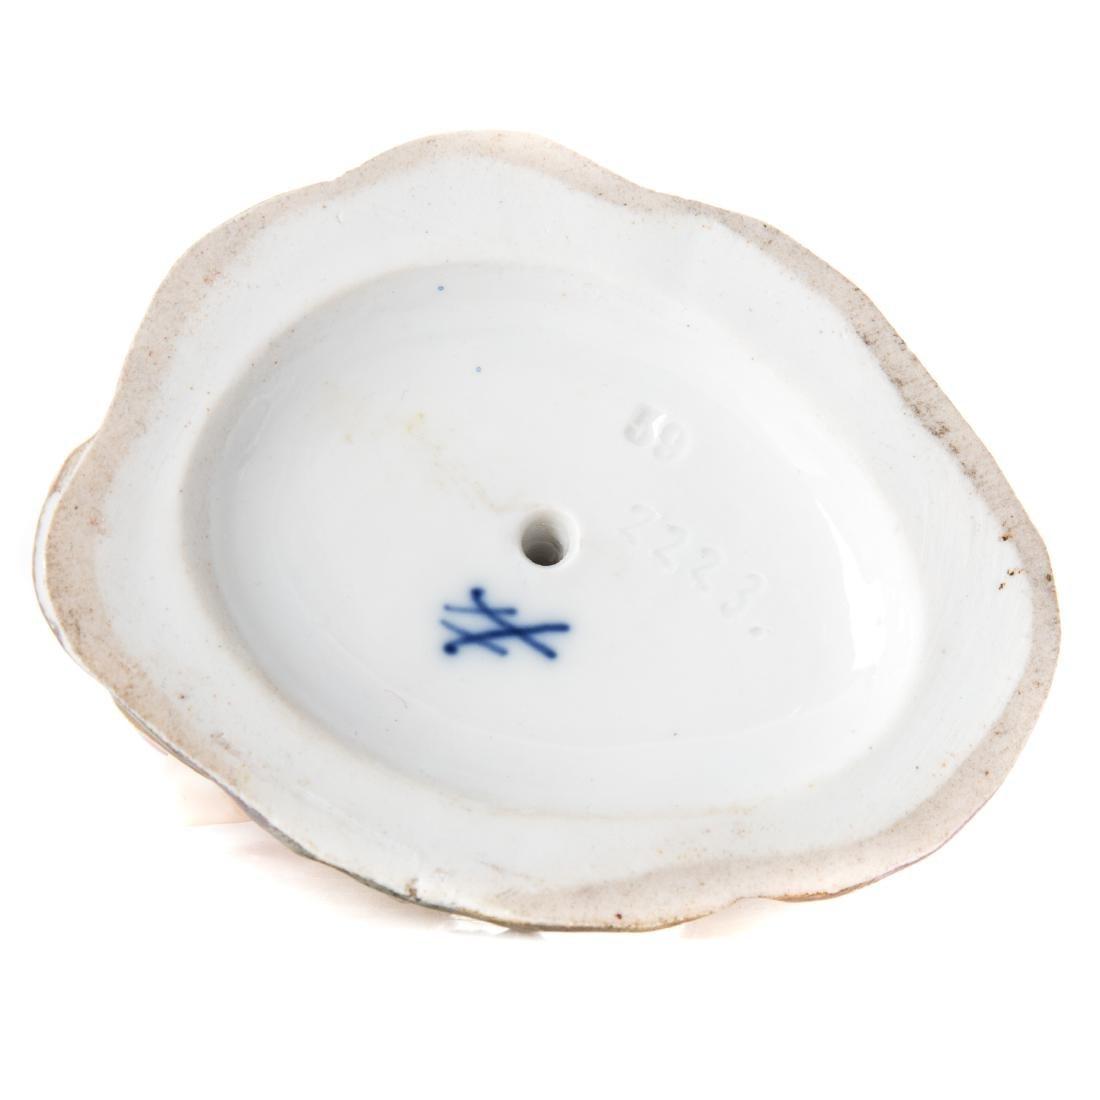 Meissen porcelain figural group and match safe - 5